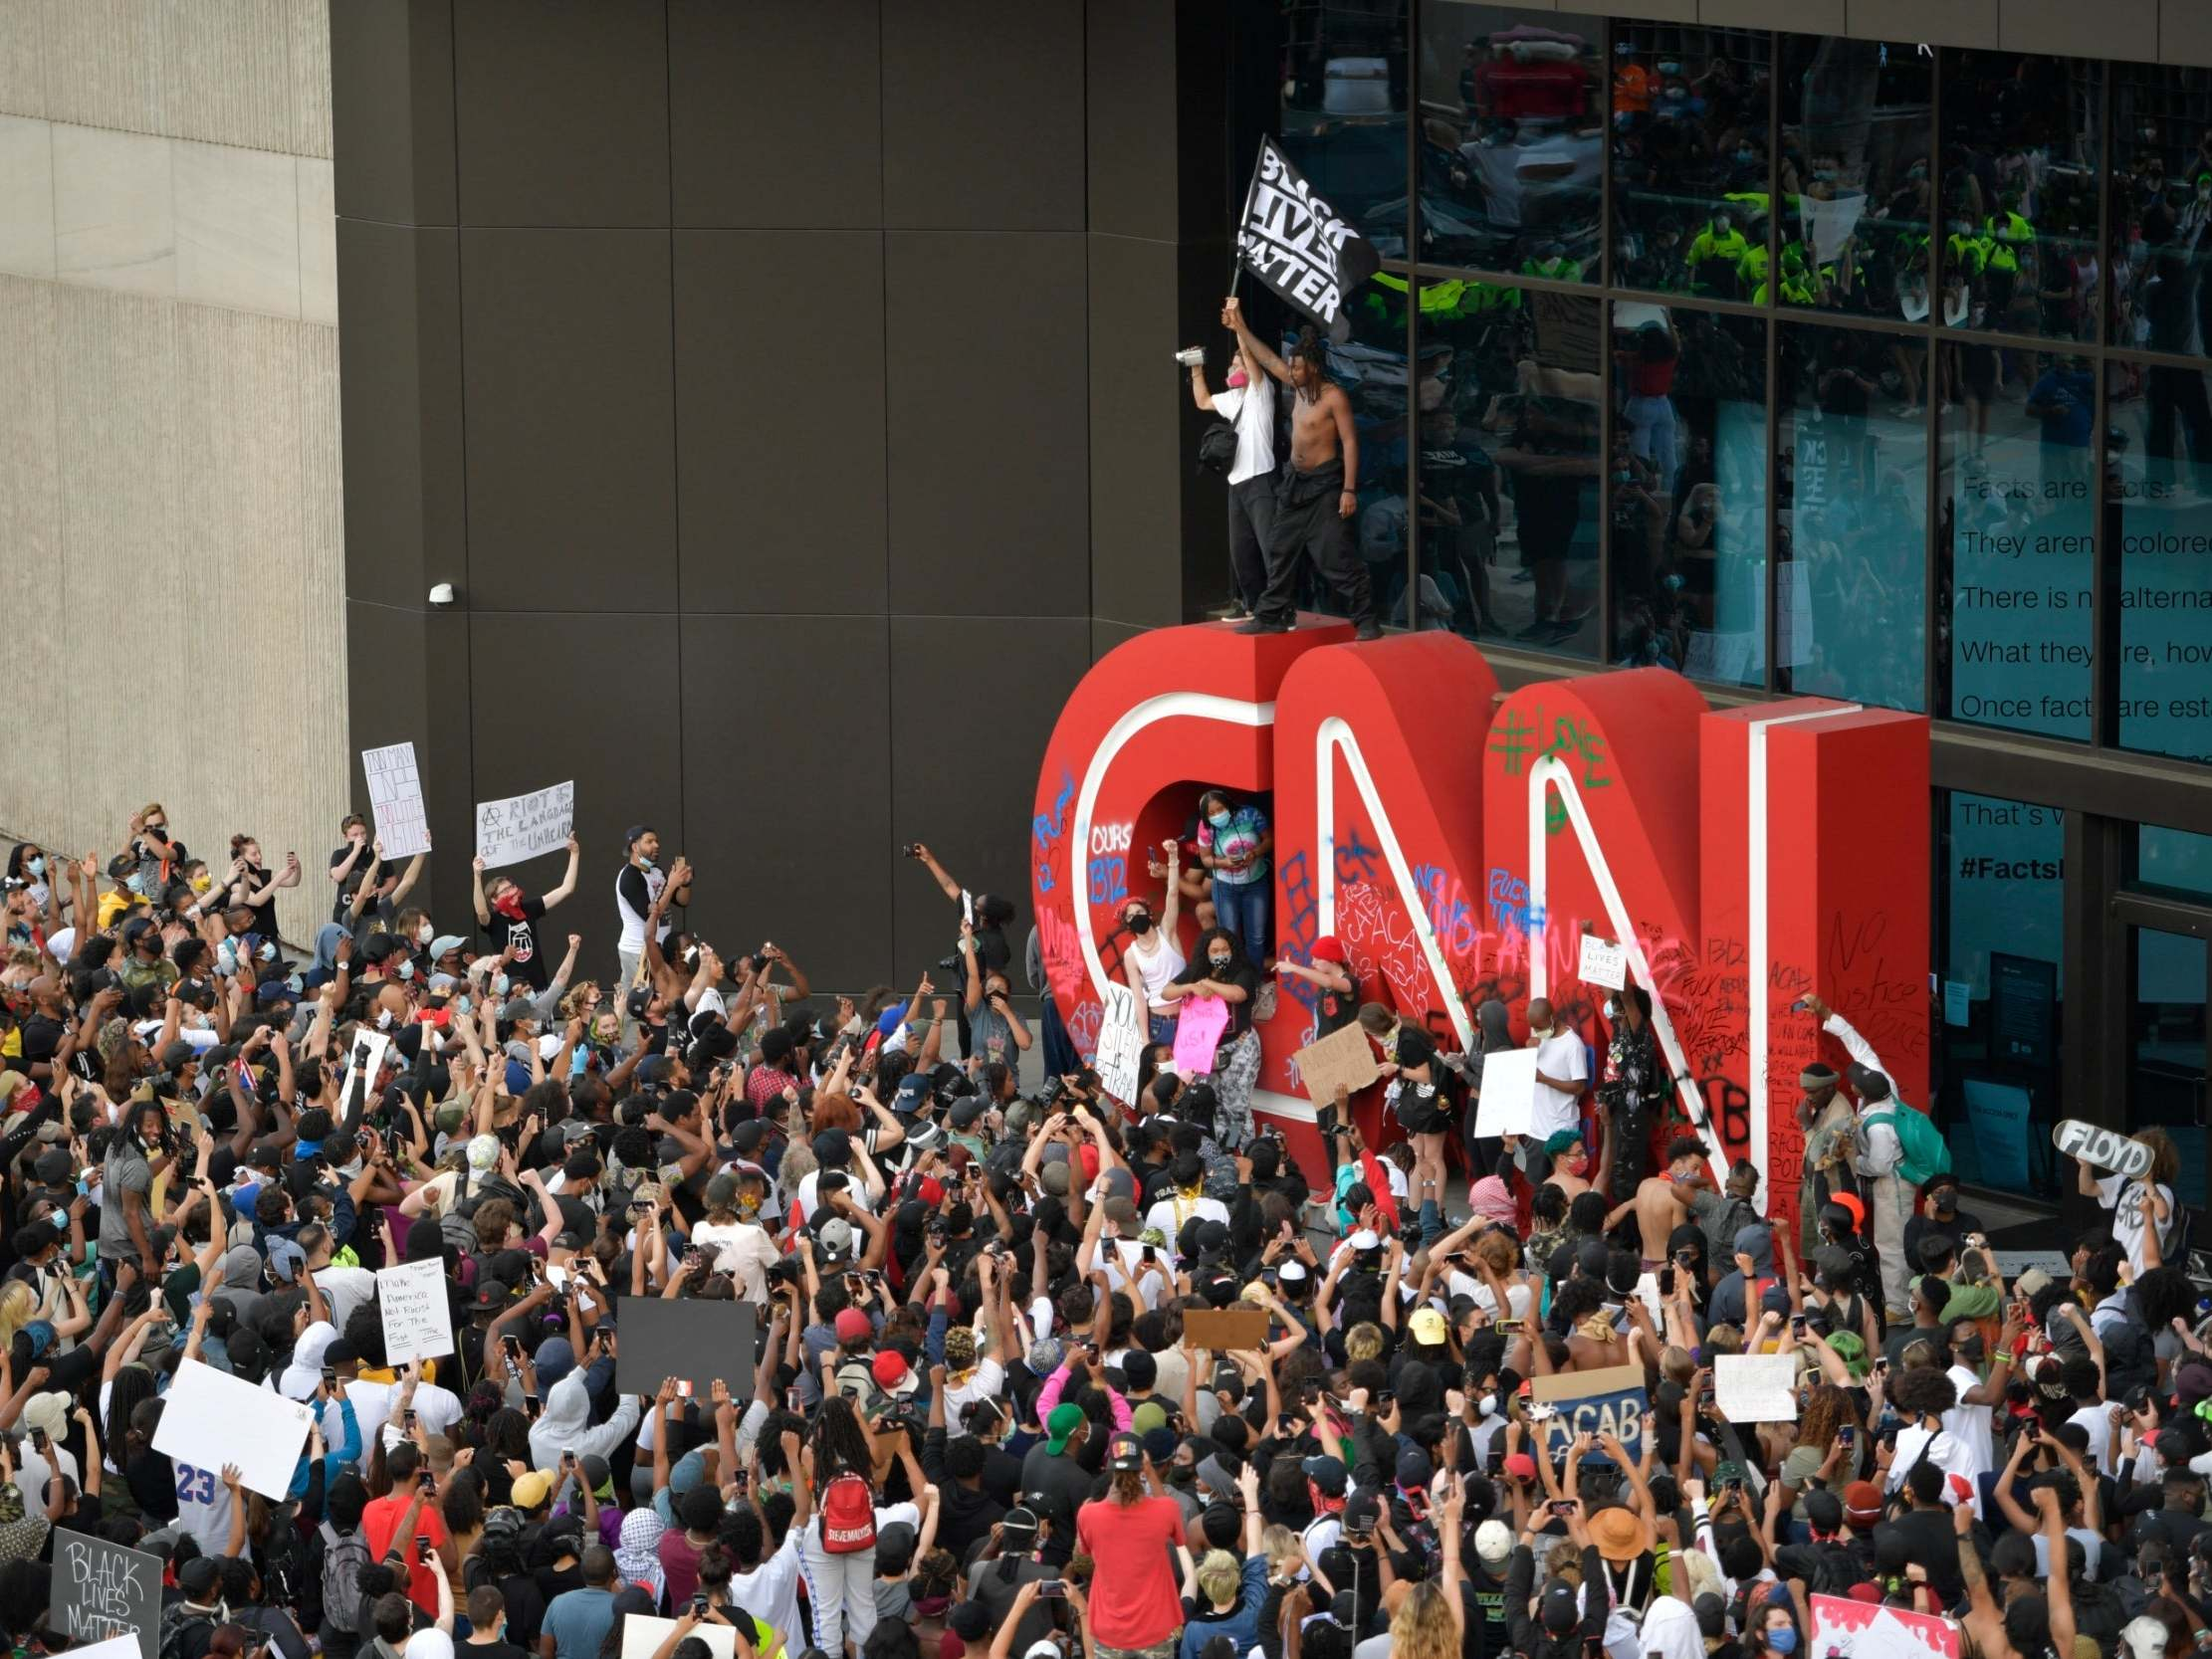 George Floyd: Atlanta protesters attack CNN building as mayor says 'go home'